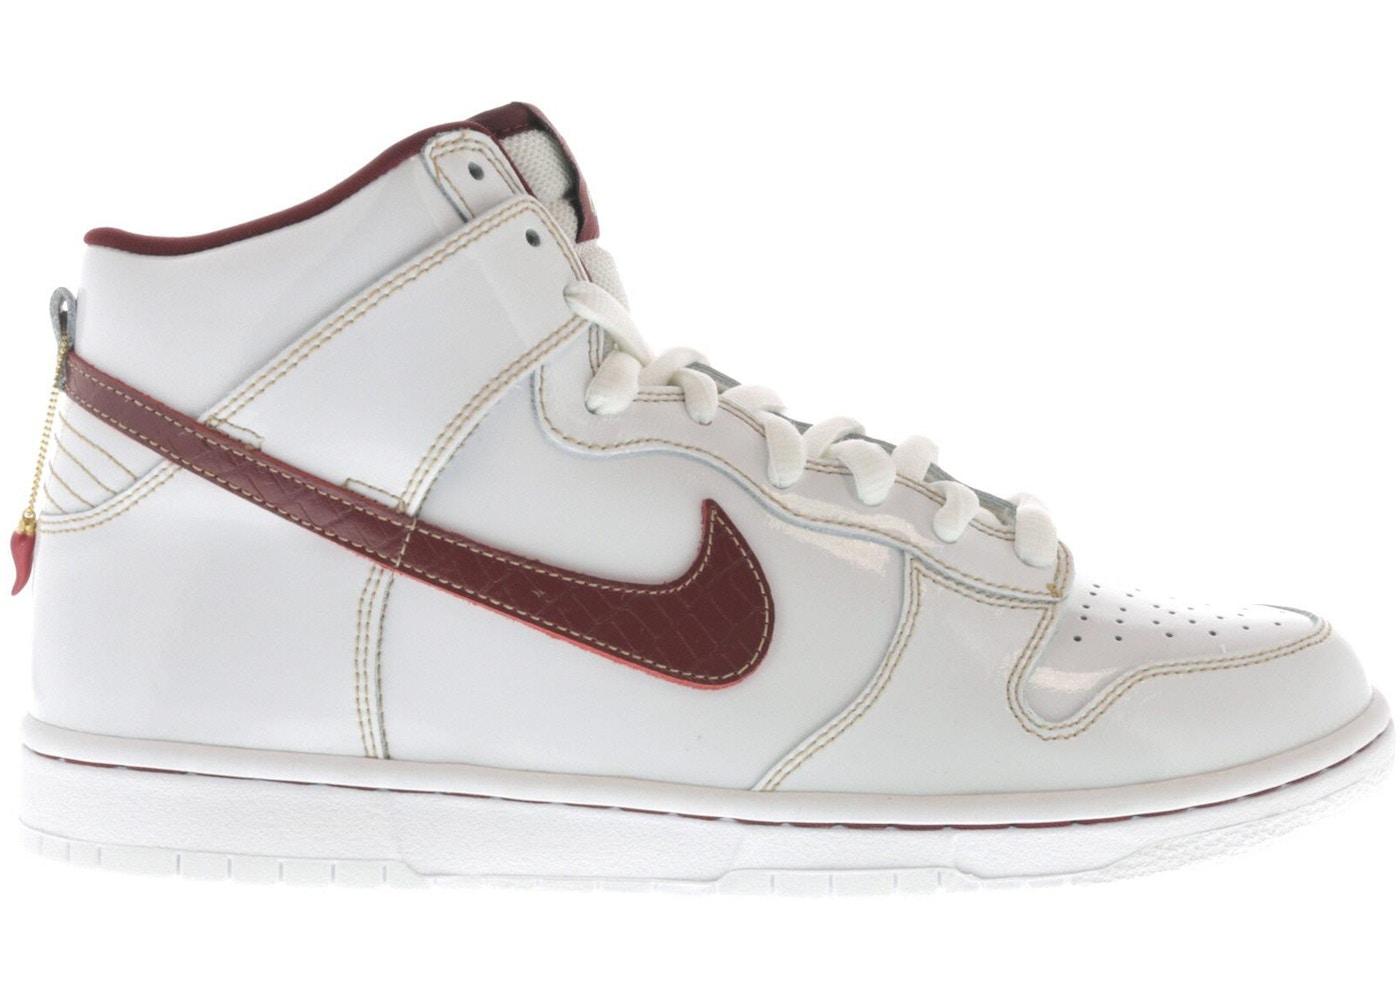 competitive price 6509e f7feb Nike Dunk SB High Mafia Pack - 313171-161